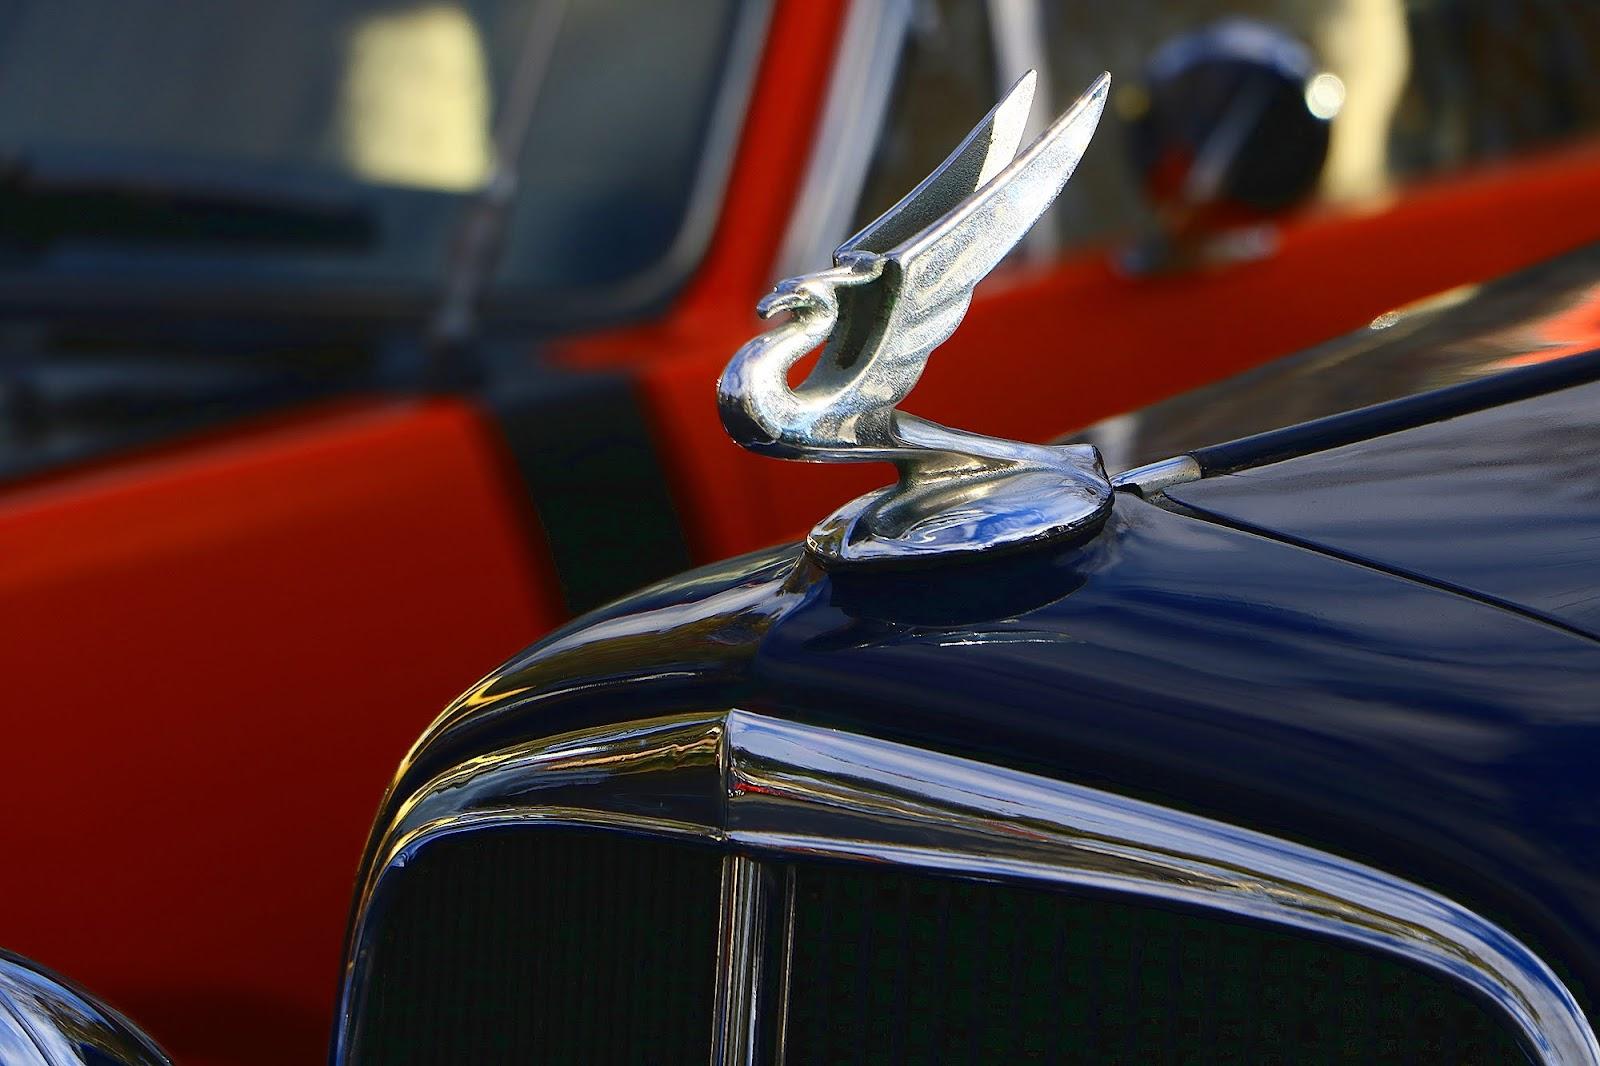 1934 Chevrolet Hotrod Hood Emblem.jpg